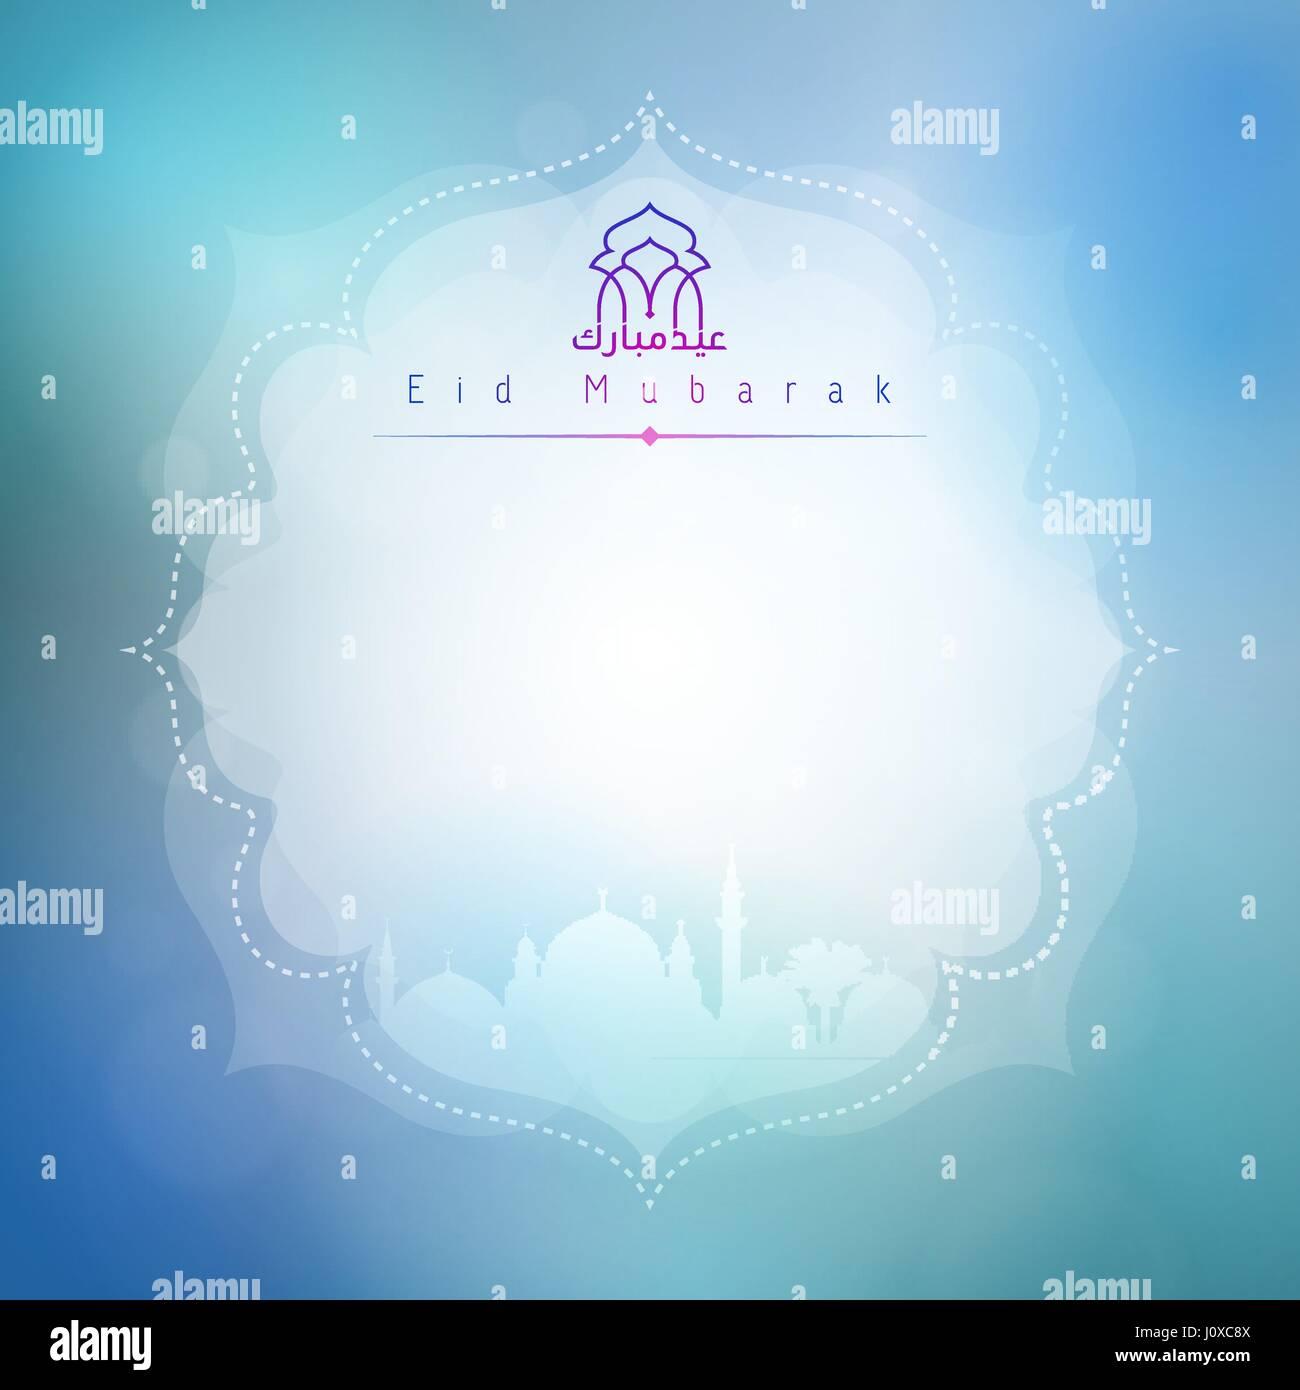 Eid Mubarak Card Stock Vector Images Alamy